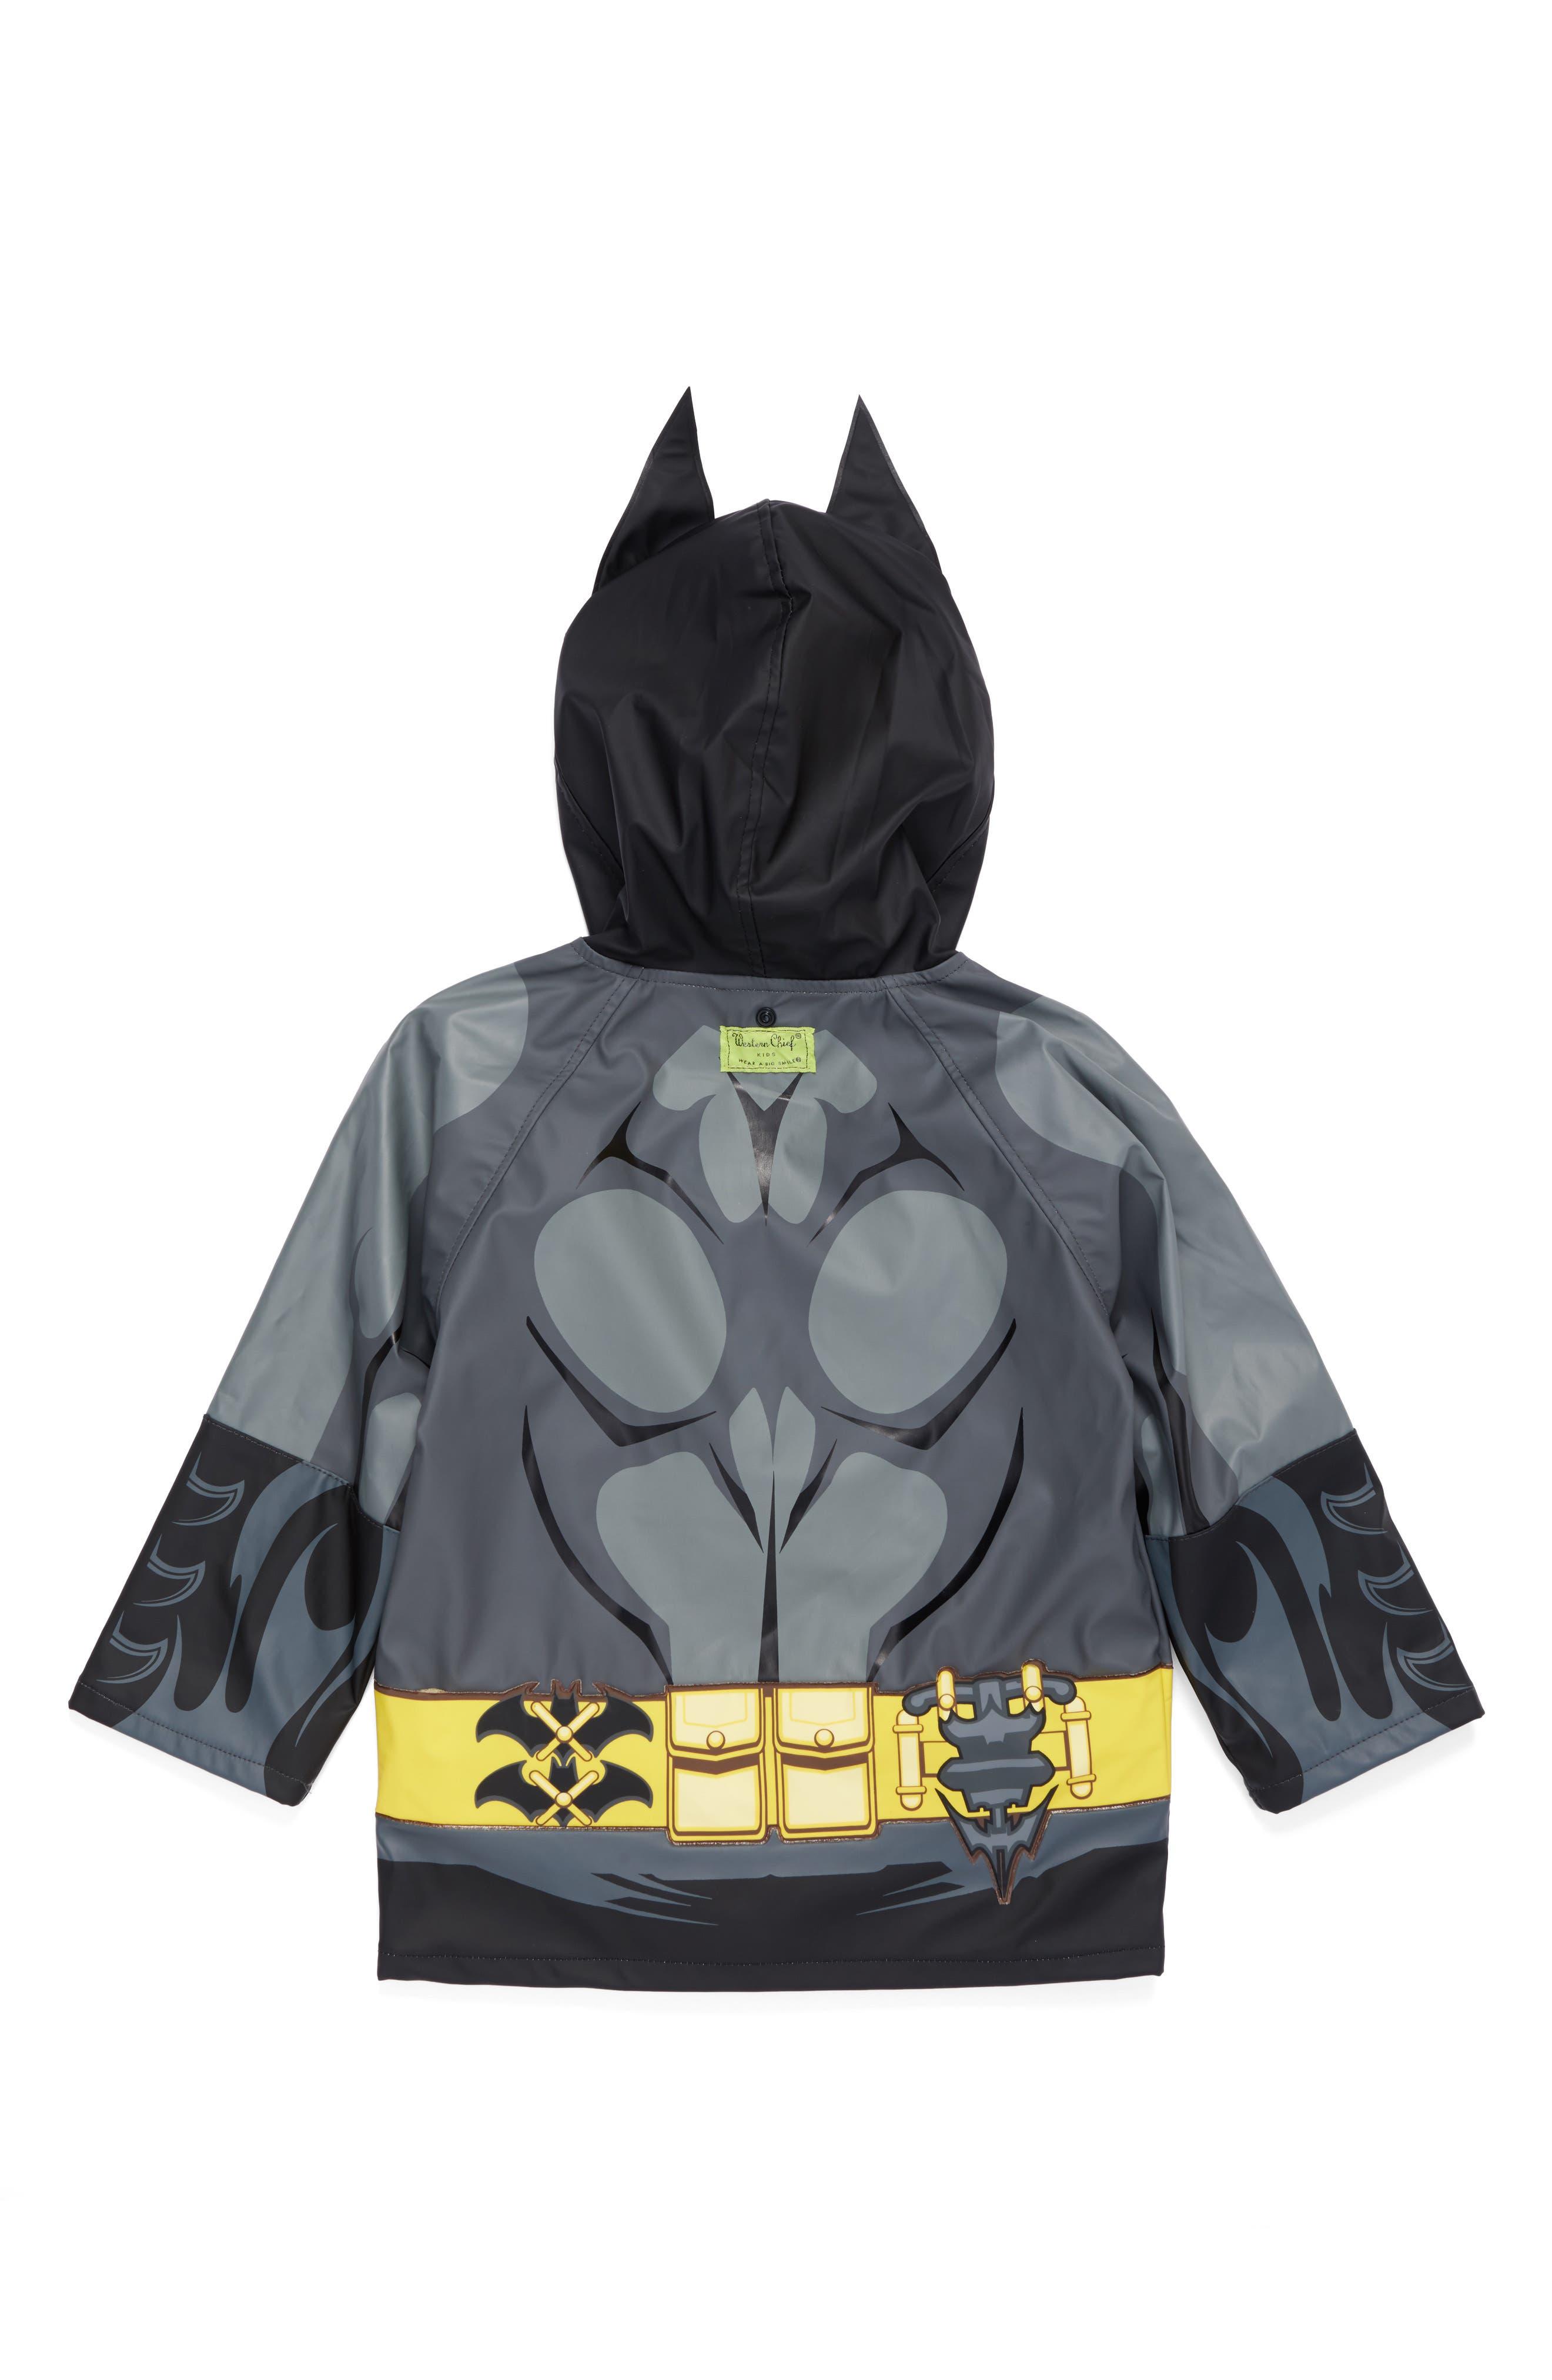 Batman Everlasting Hooded Raincoat,                             Alternate thumbnail 2, color,                             Black